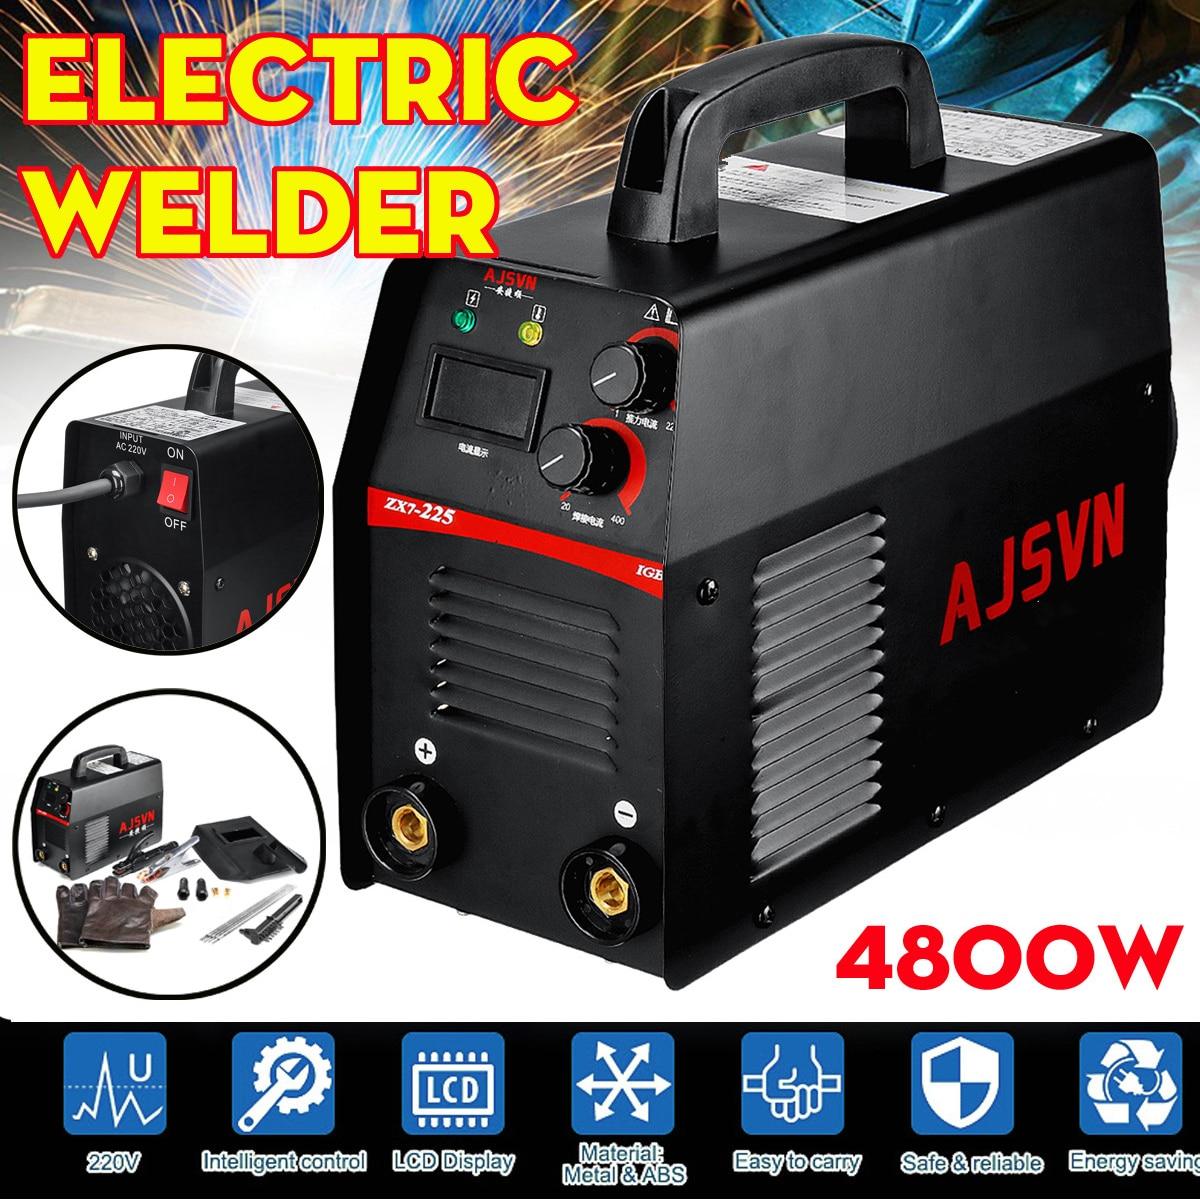 20A-225A 5000W Handheld IGBT Inverter Arc Welder-Welding Machine Digital Display Mini Portable Welding Tool